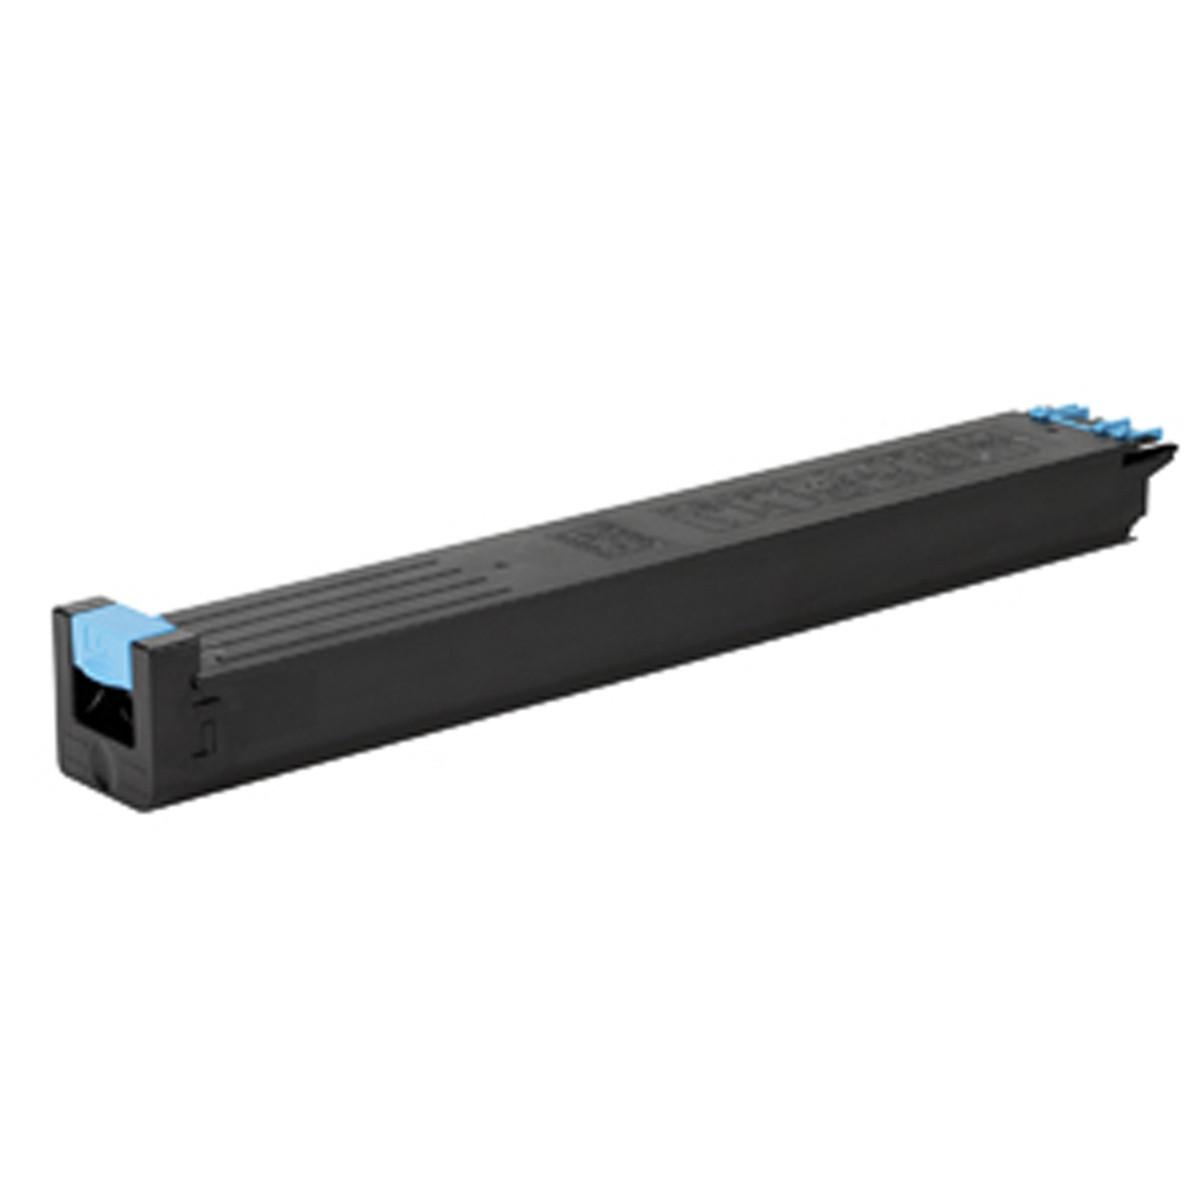 Toner Sharp MX-31NTCA Ciano | MX2600 MX3100 MX4100 MX4101 MX5001 | Katun Performance 285g